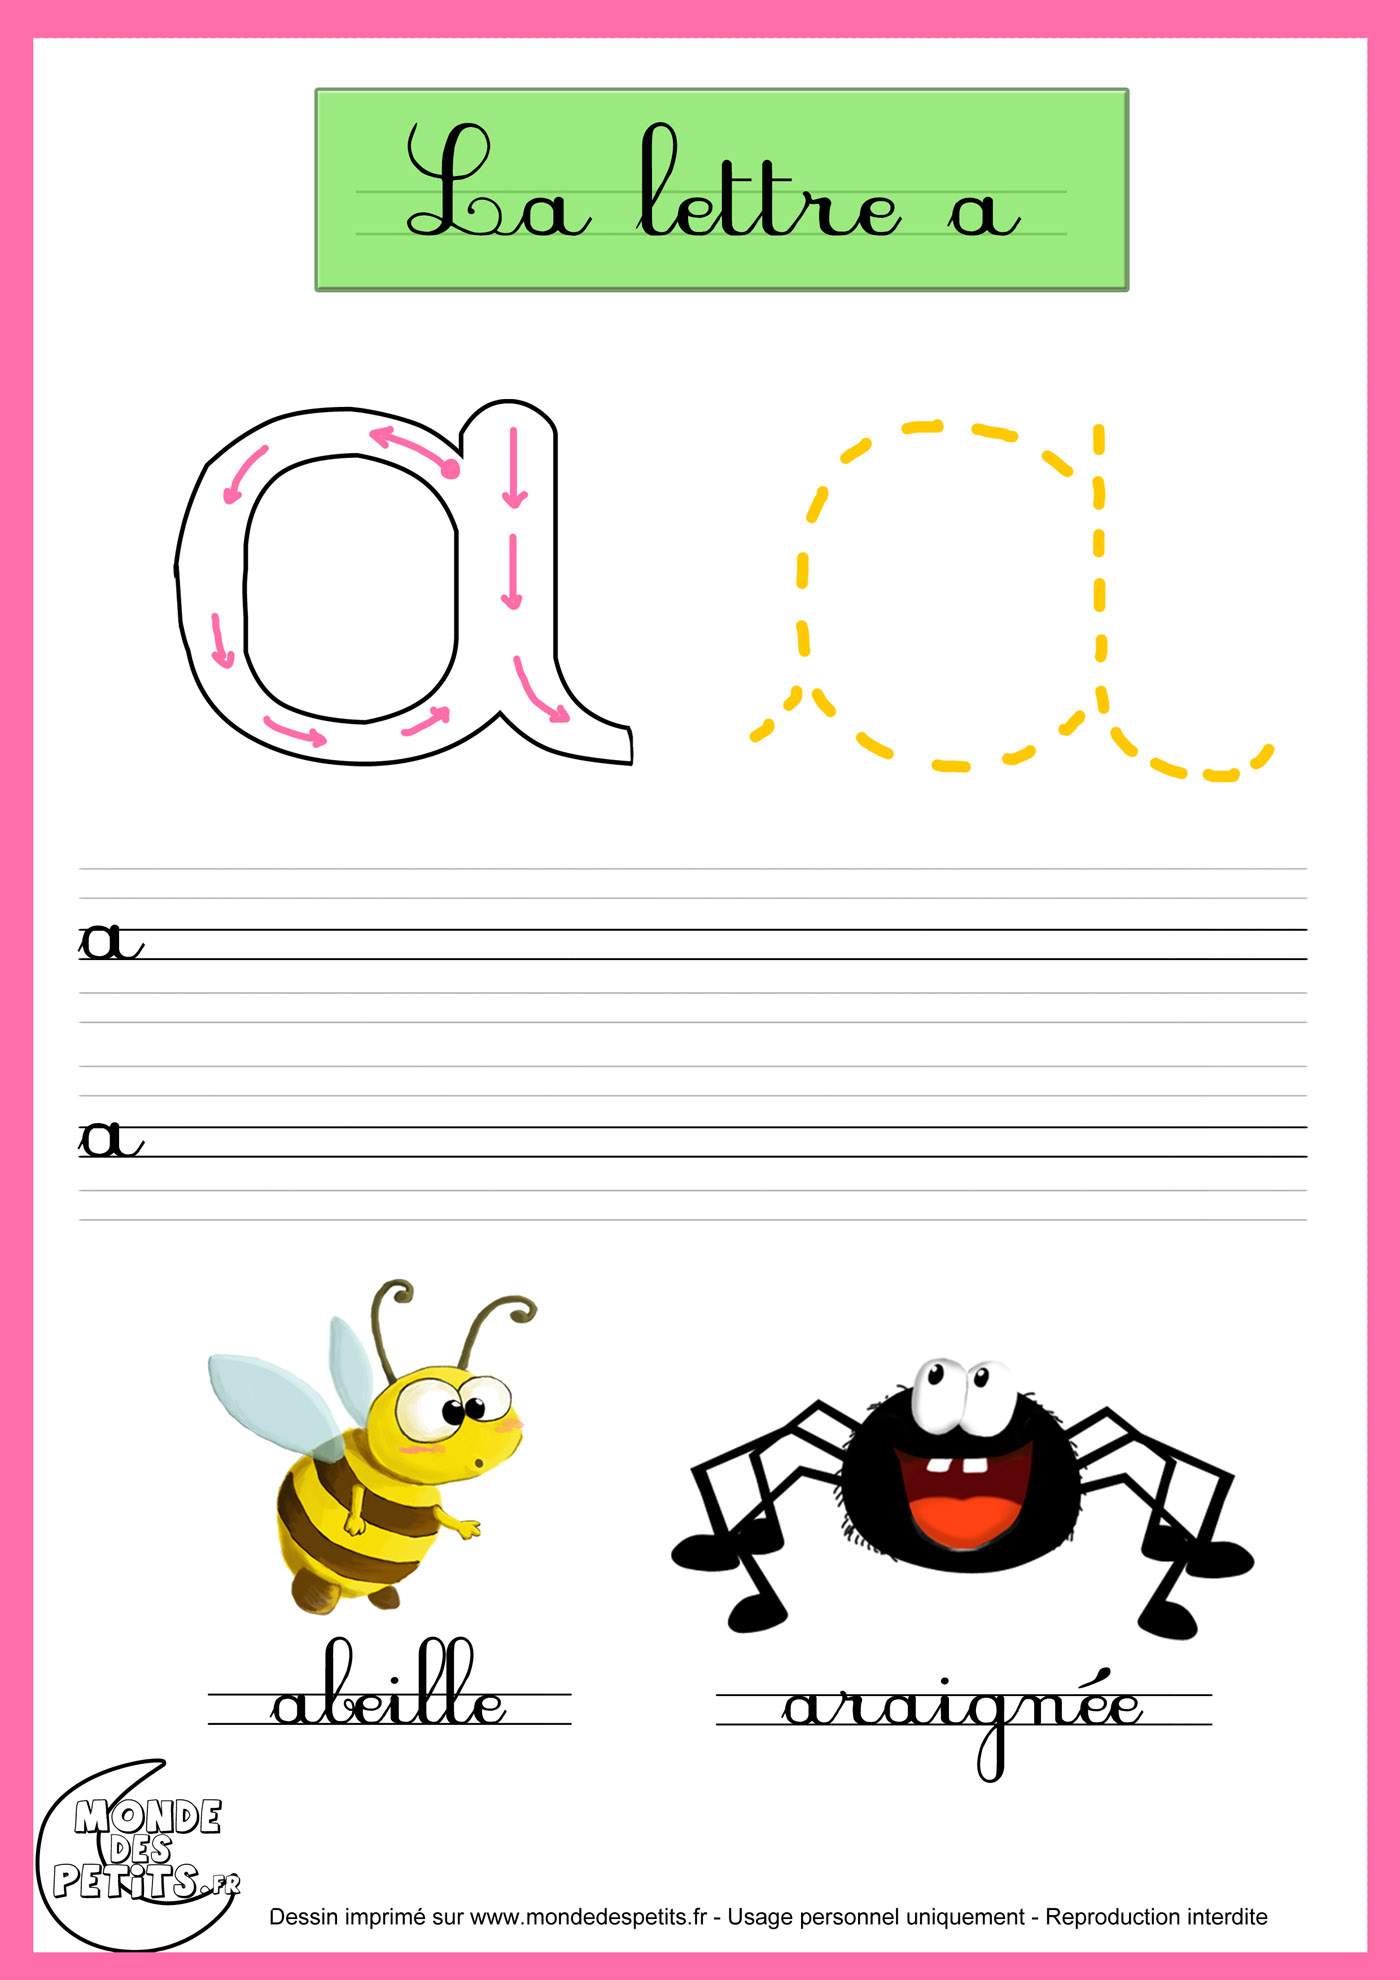 Apprendre crire en cursive du14 jornalagora - Apprendre a broder des lettres ...